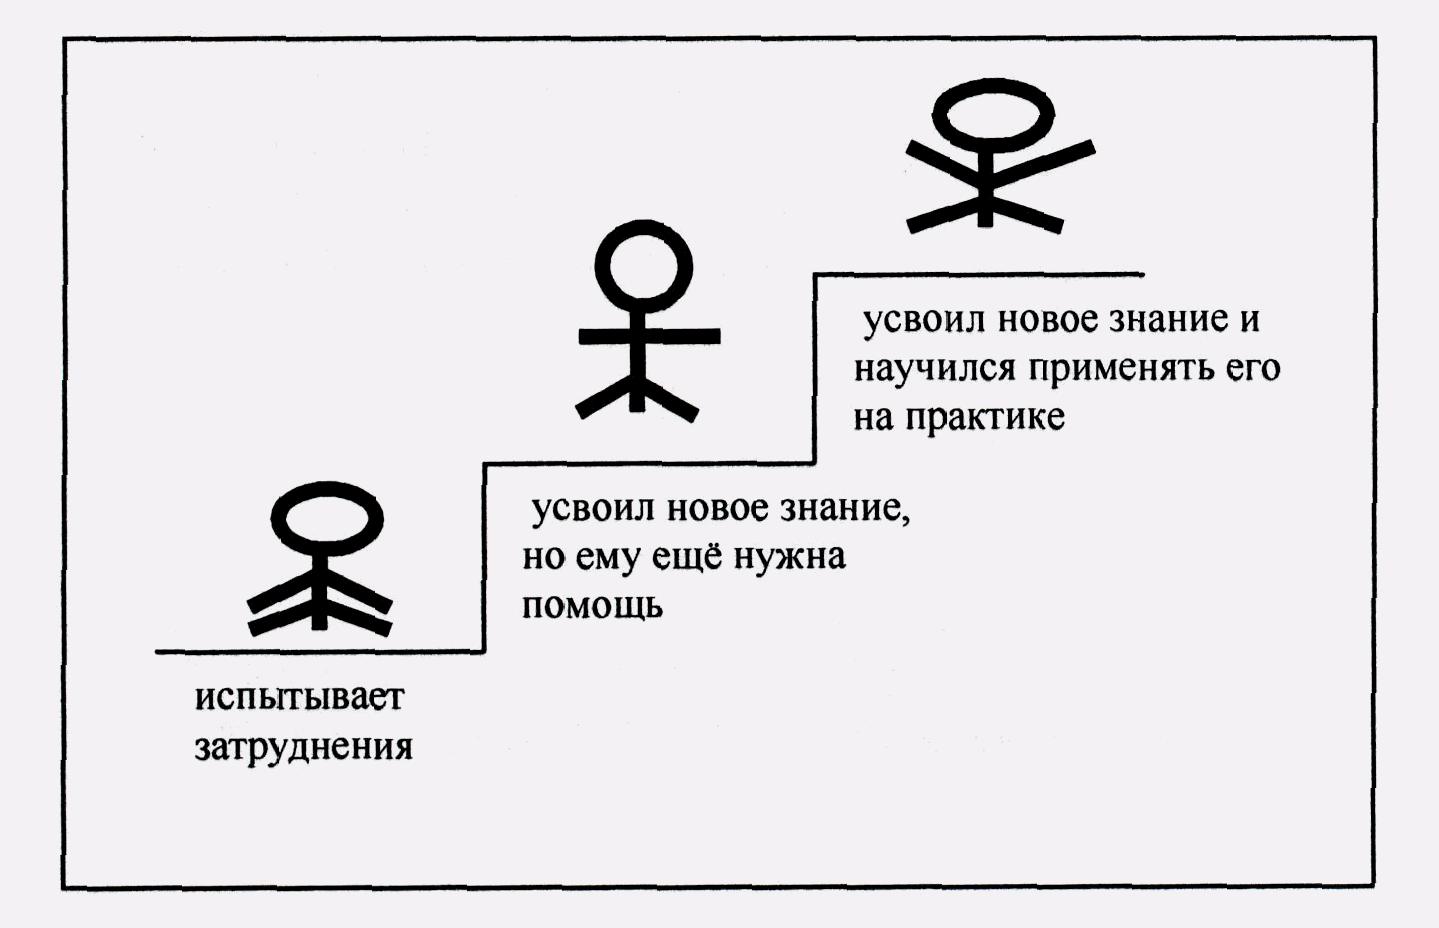 http://100-bal.ru/pars_docs/refs/57/56532/56532_html_35dc679e.png